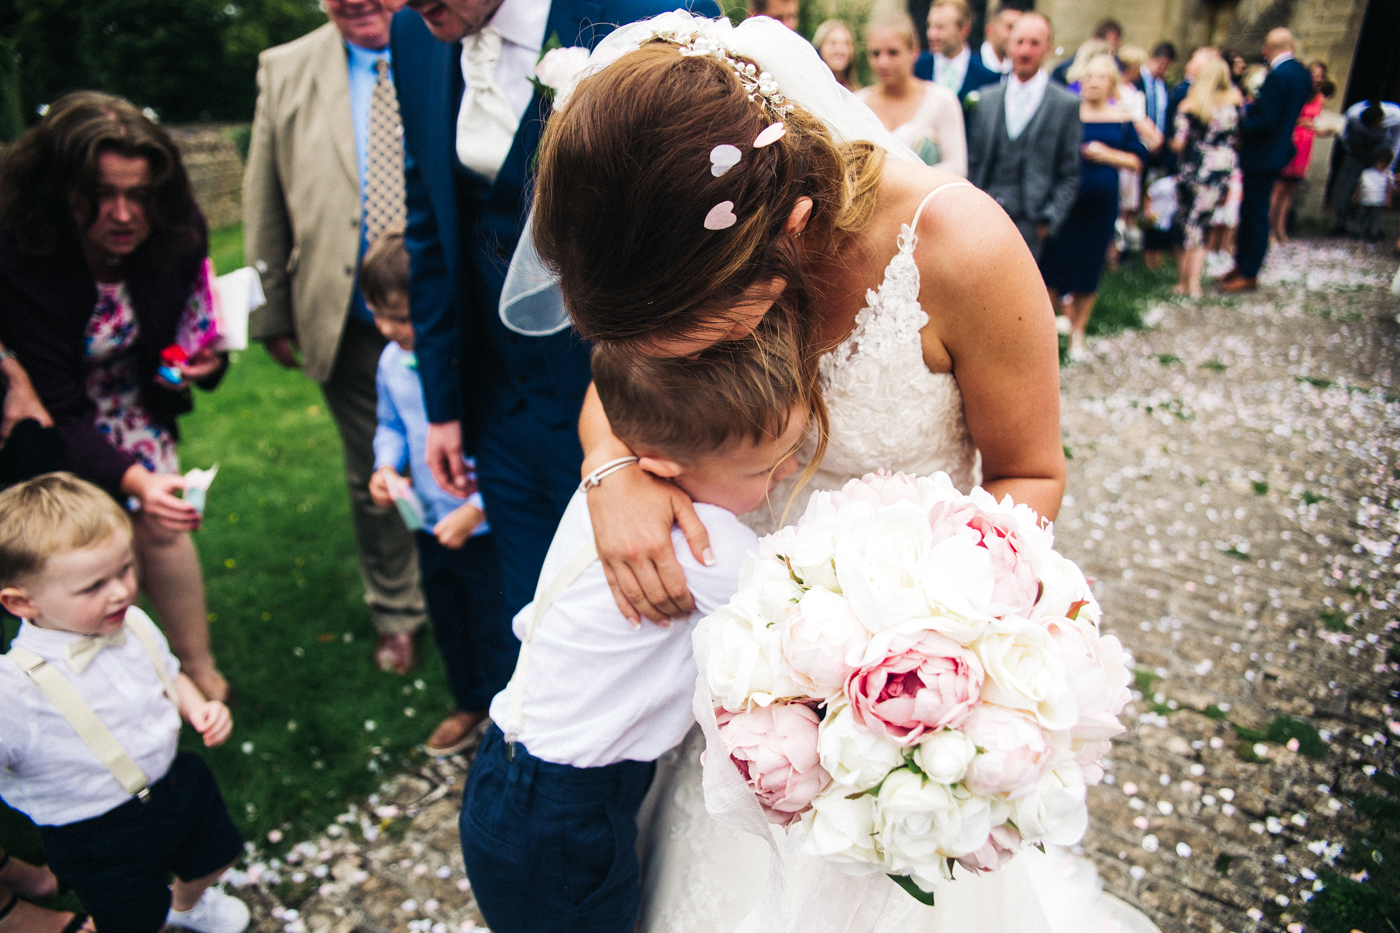 teesside-middlesbrough-north-east-wedding-photographer-creative-wedding-venues-0006.jpg